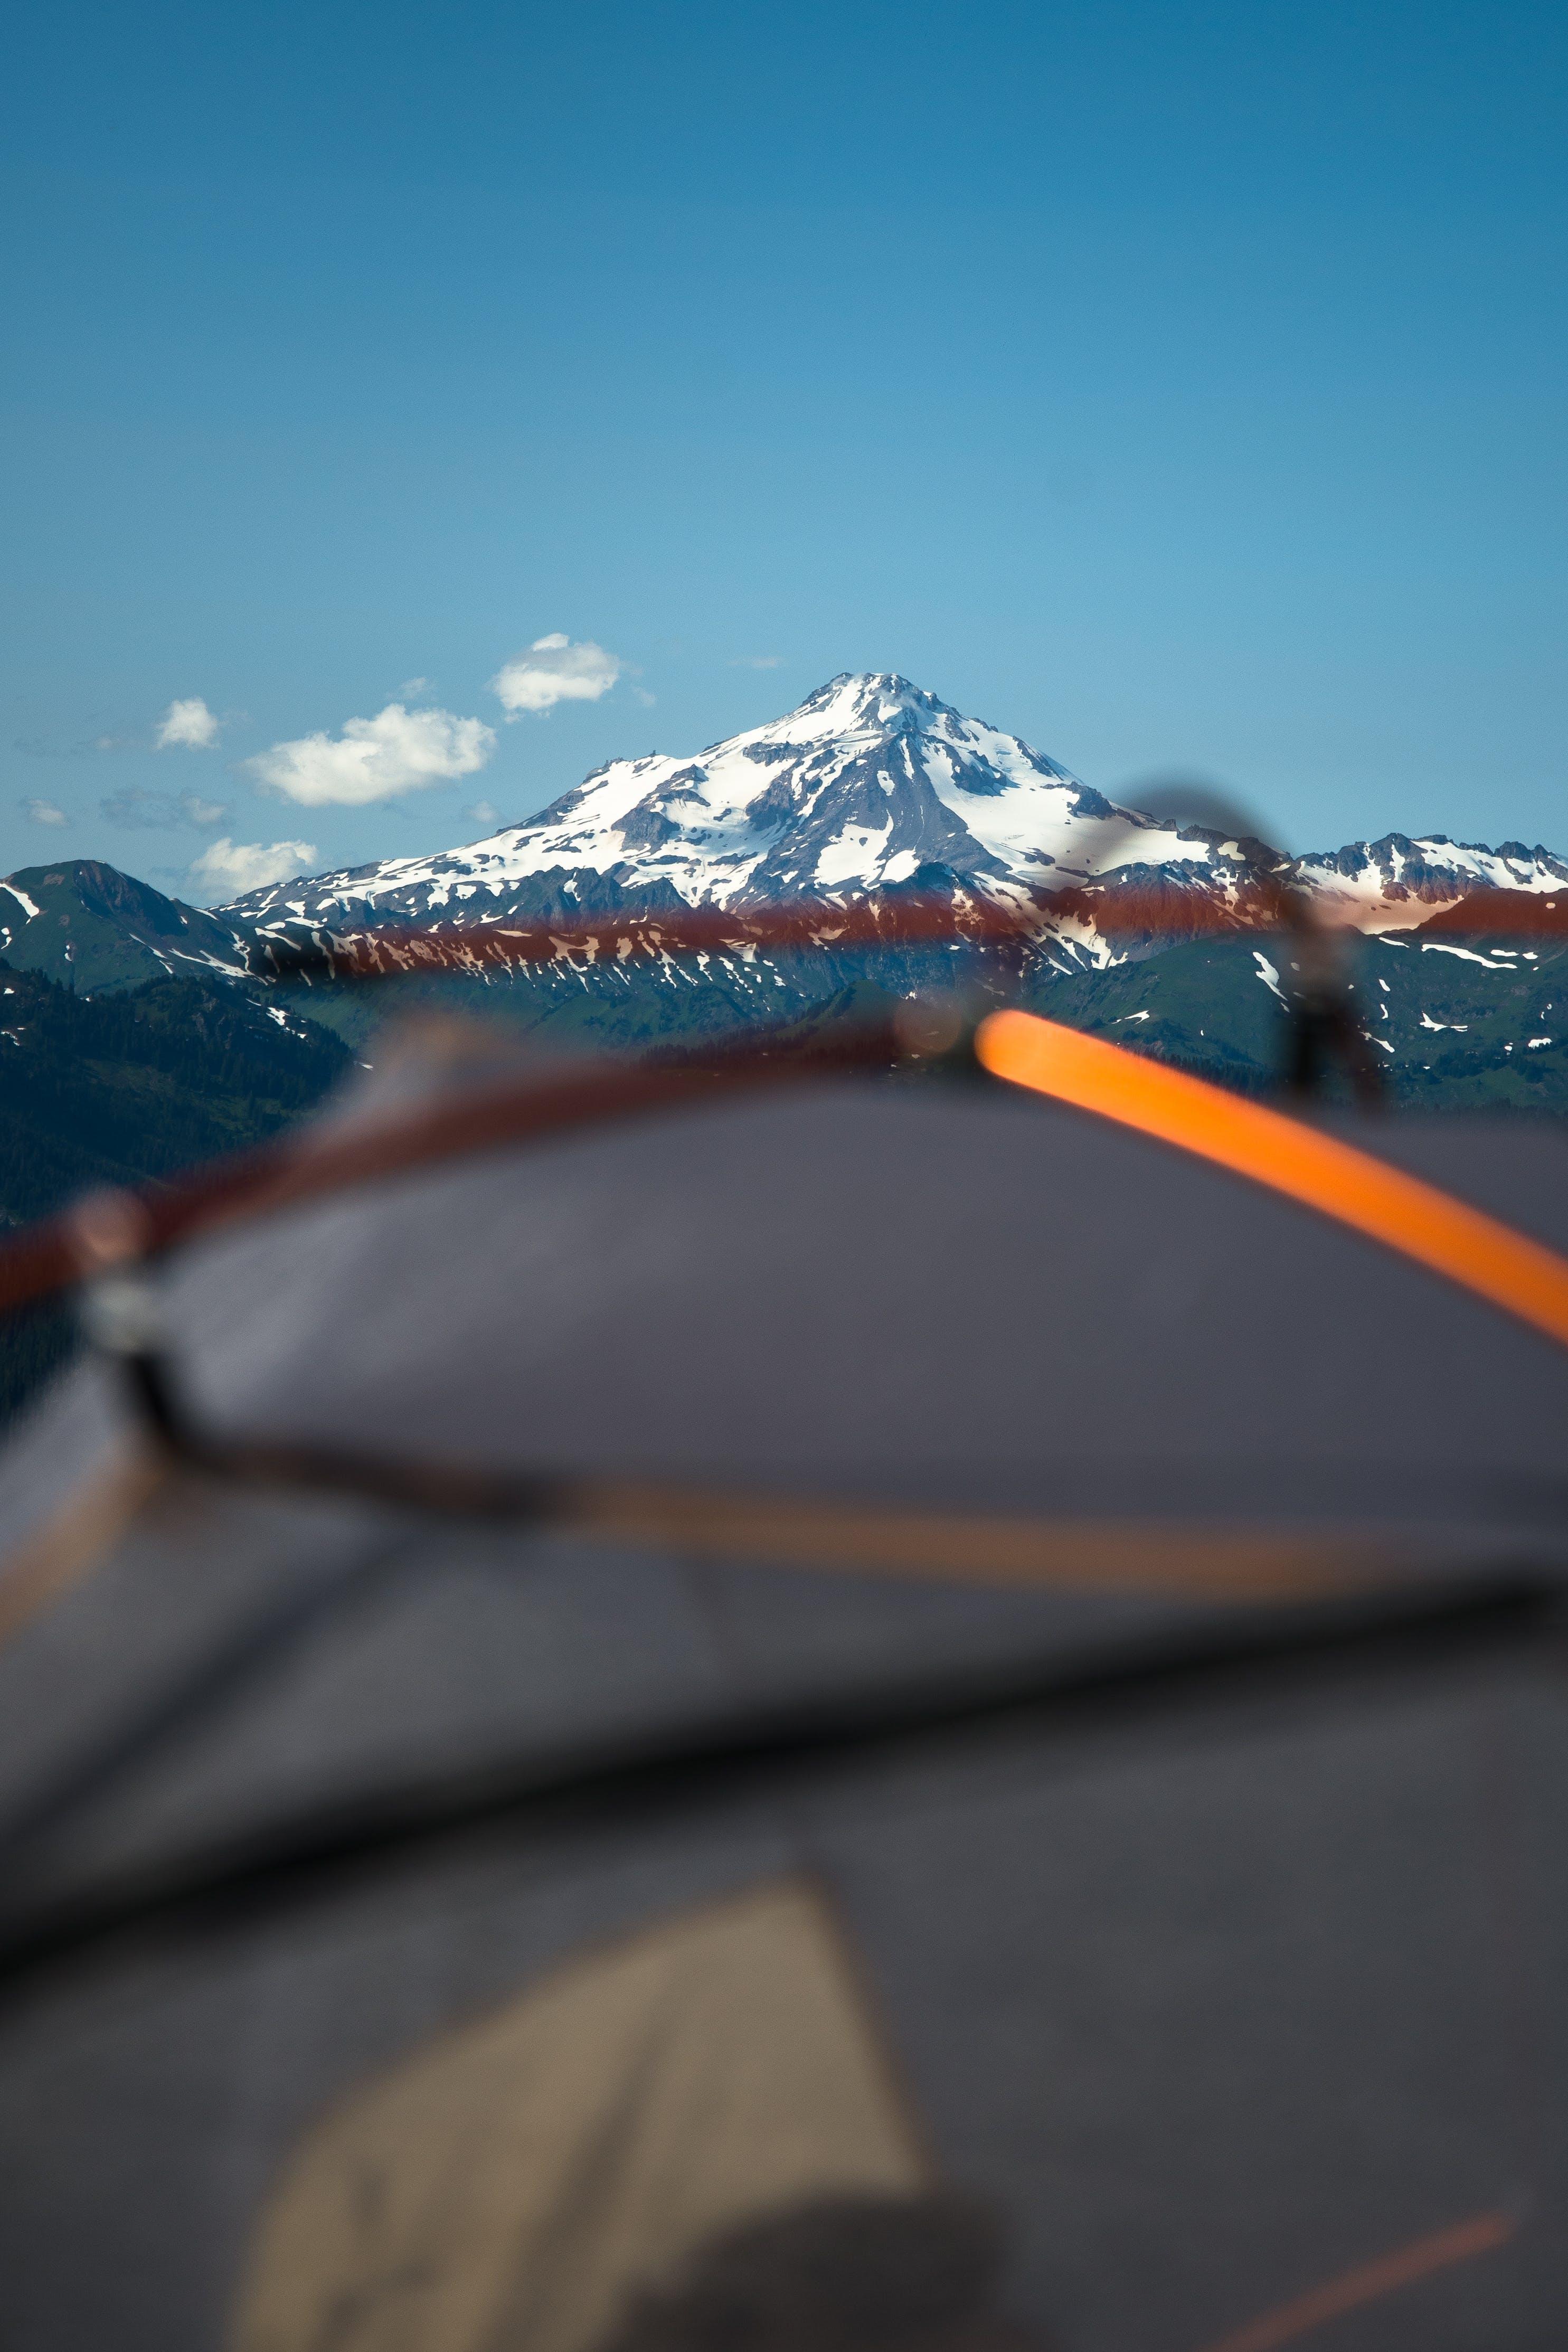 Glacier Mountain Under Clear Blue Sky